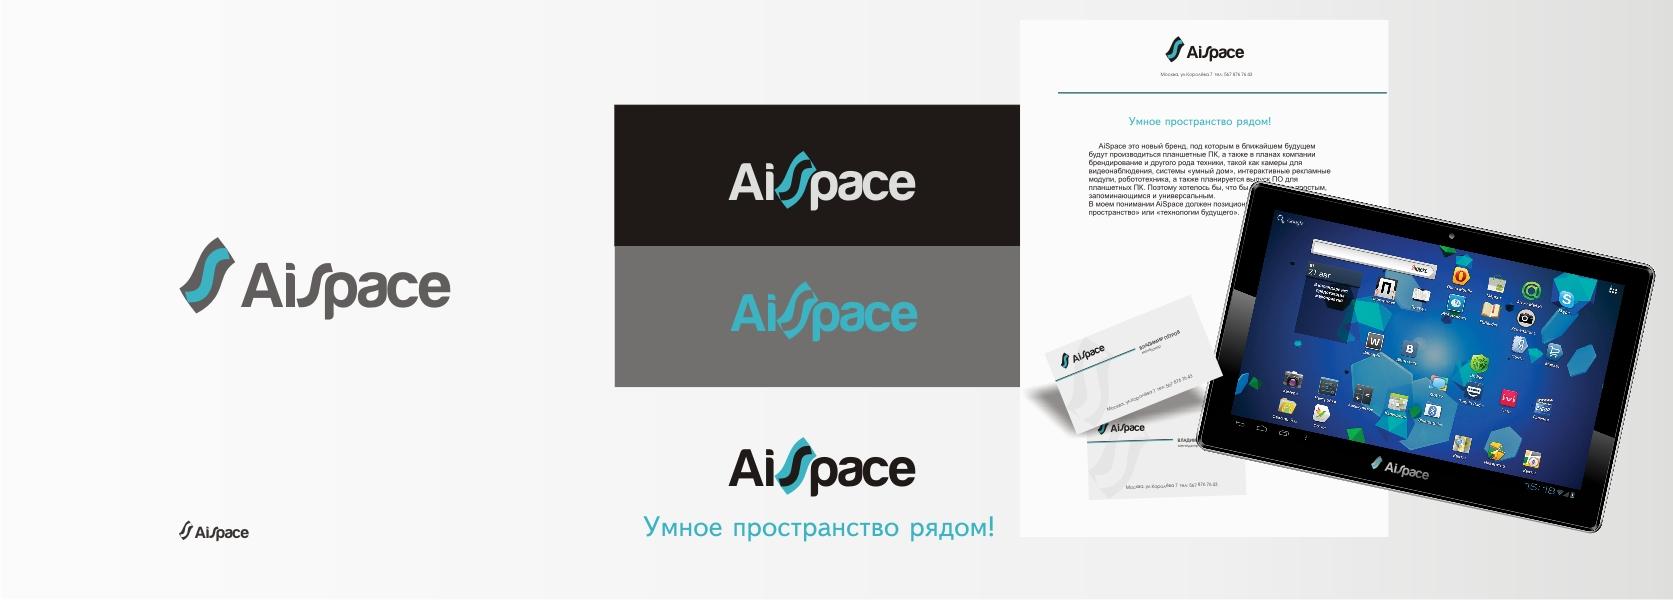 Разработать логотип и фирменный стиль для компании AiSpace фото f_34951aa16b573ea5.jpg